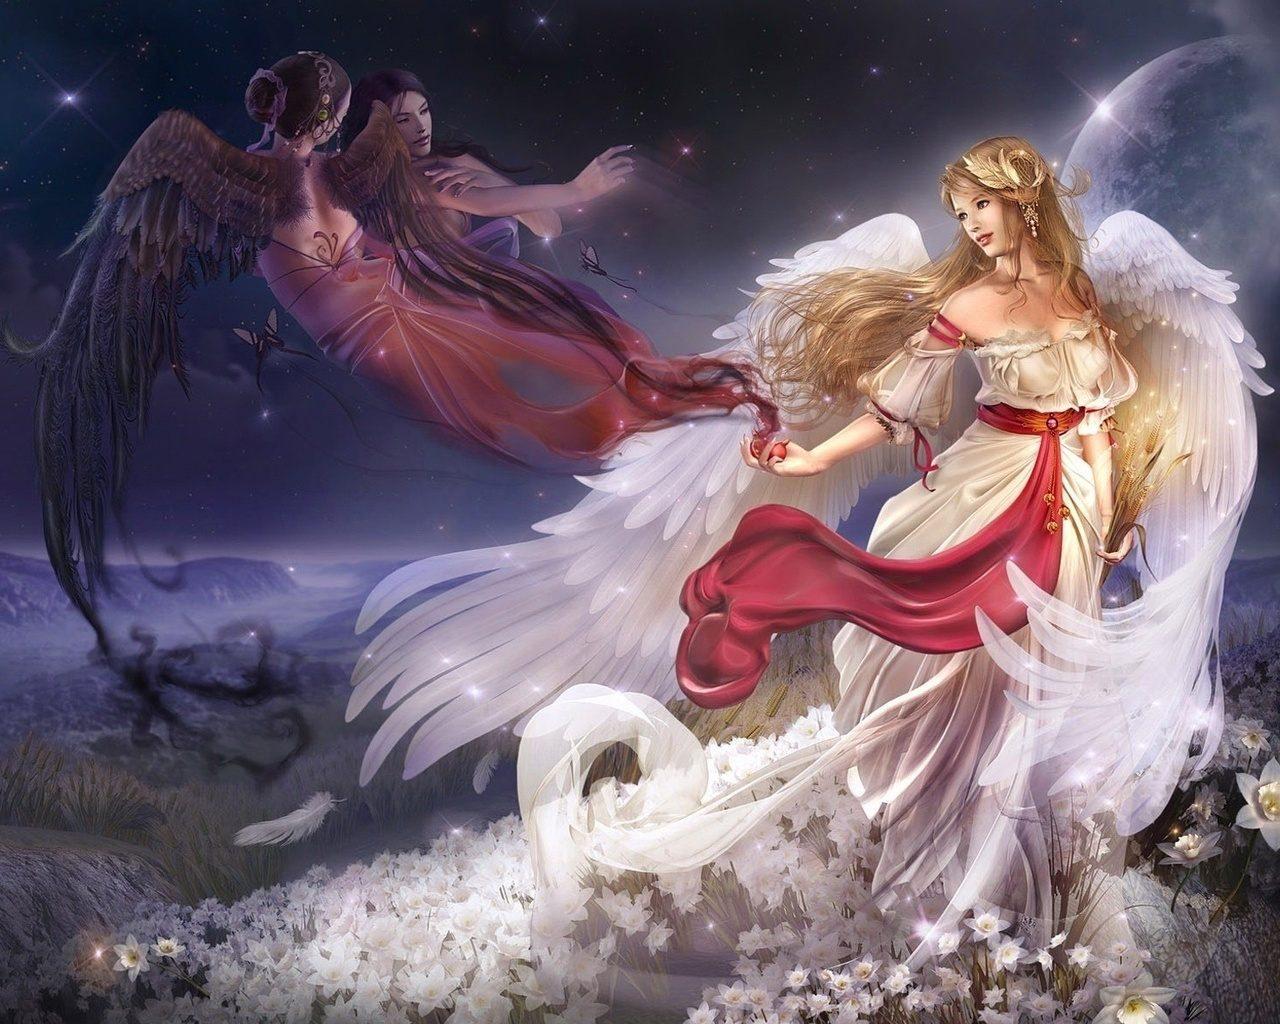 Dibujos de ángeles